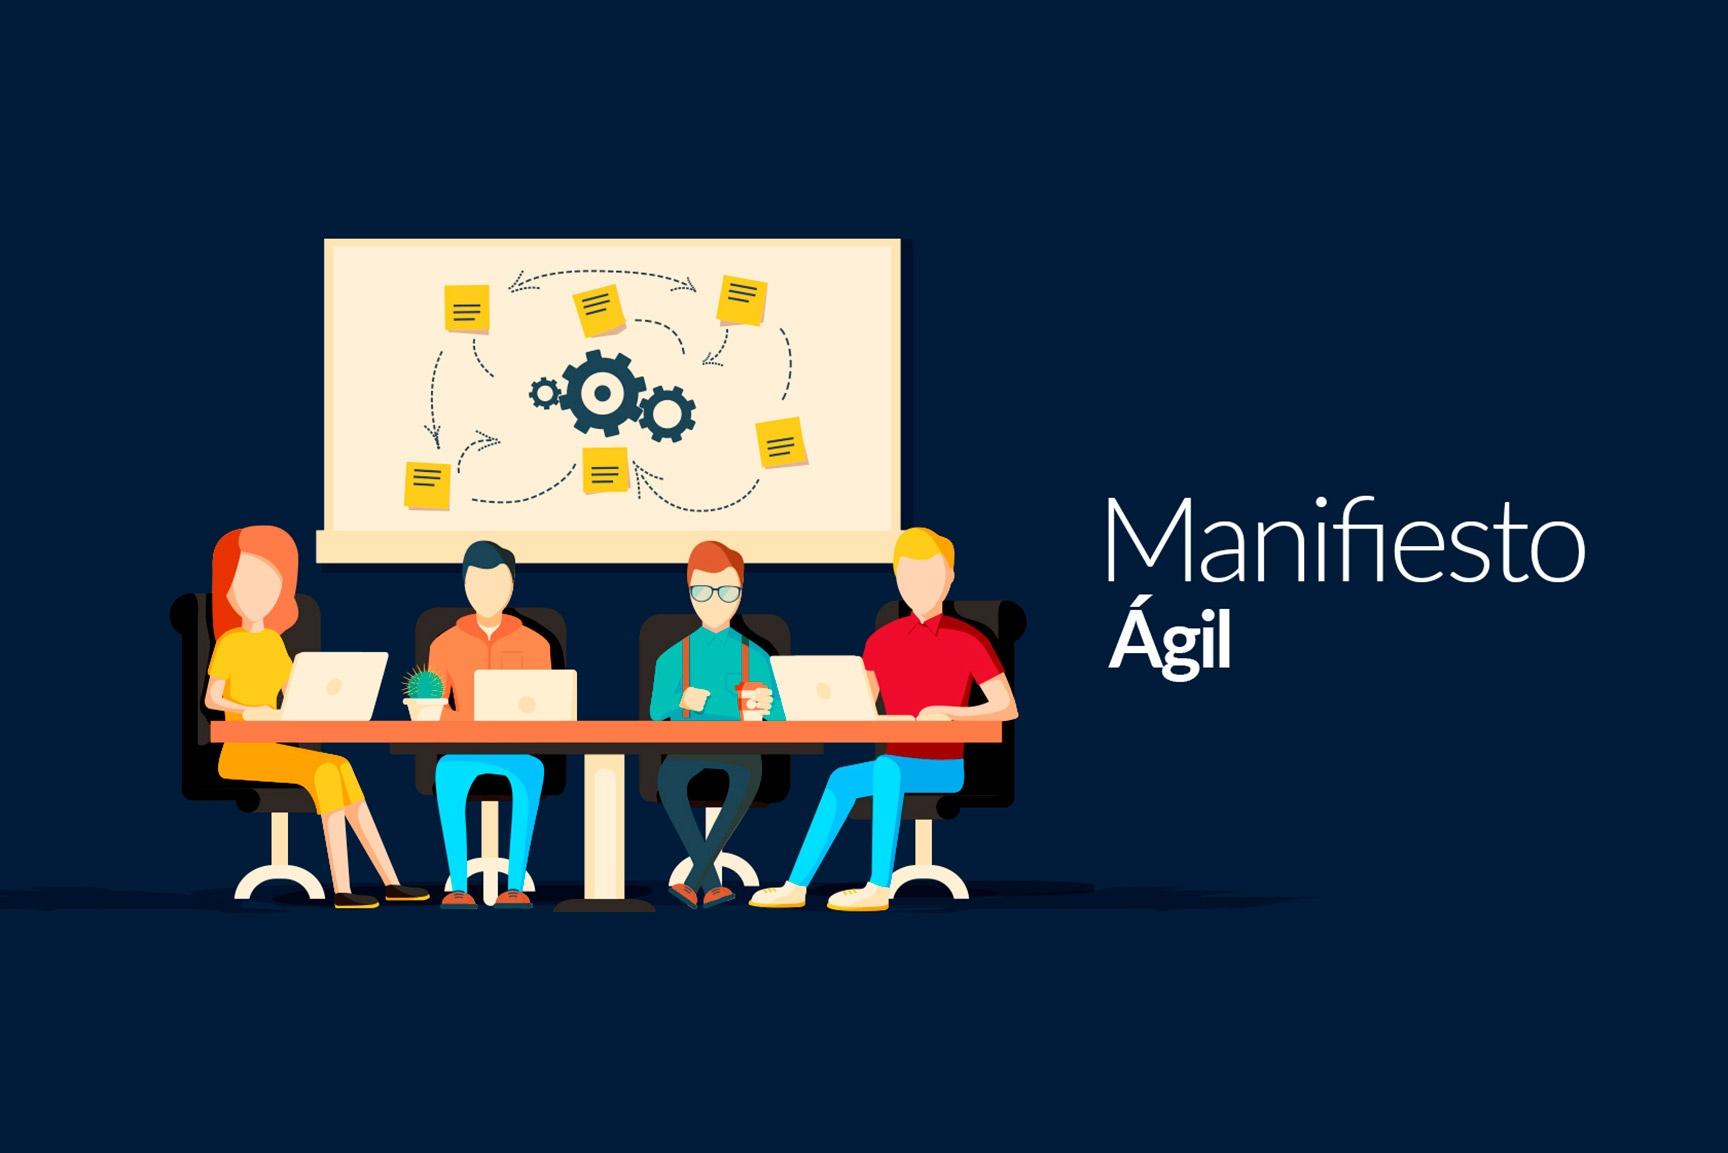 h_la_introduccion_al_manifiesto_agil - copia.jpg